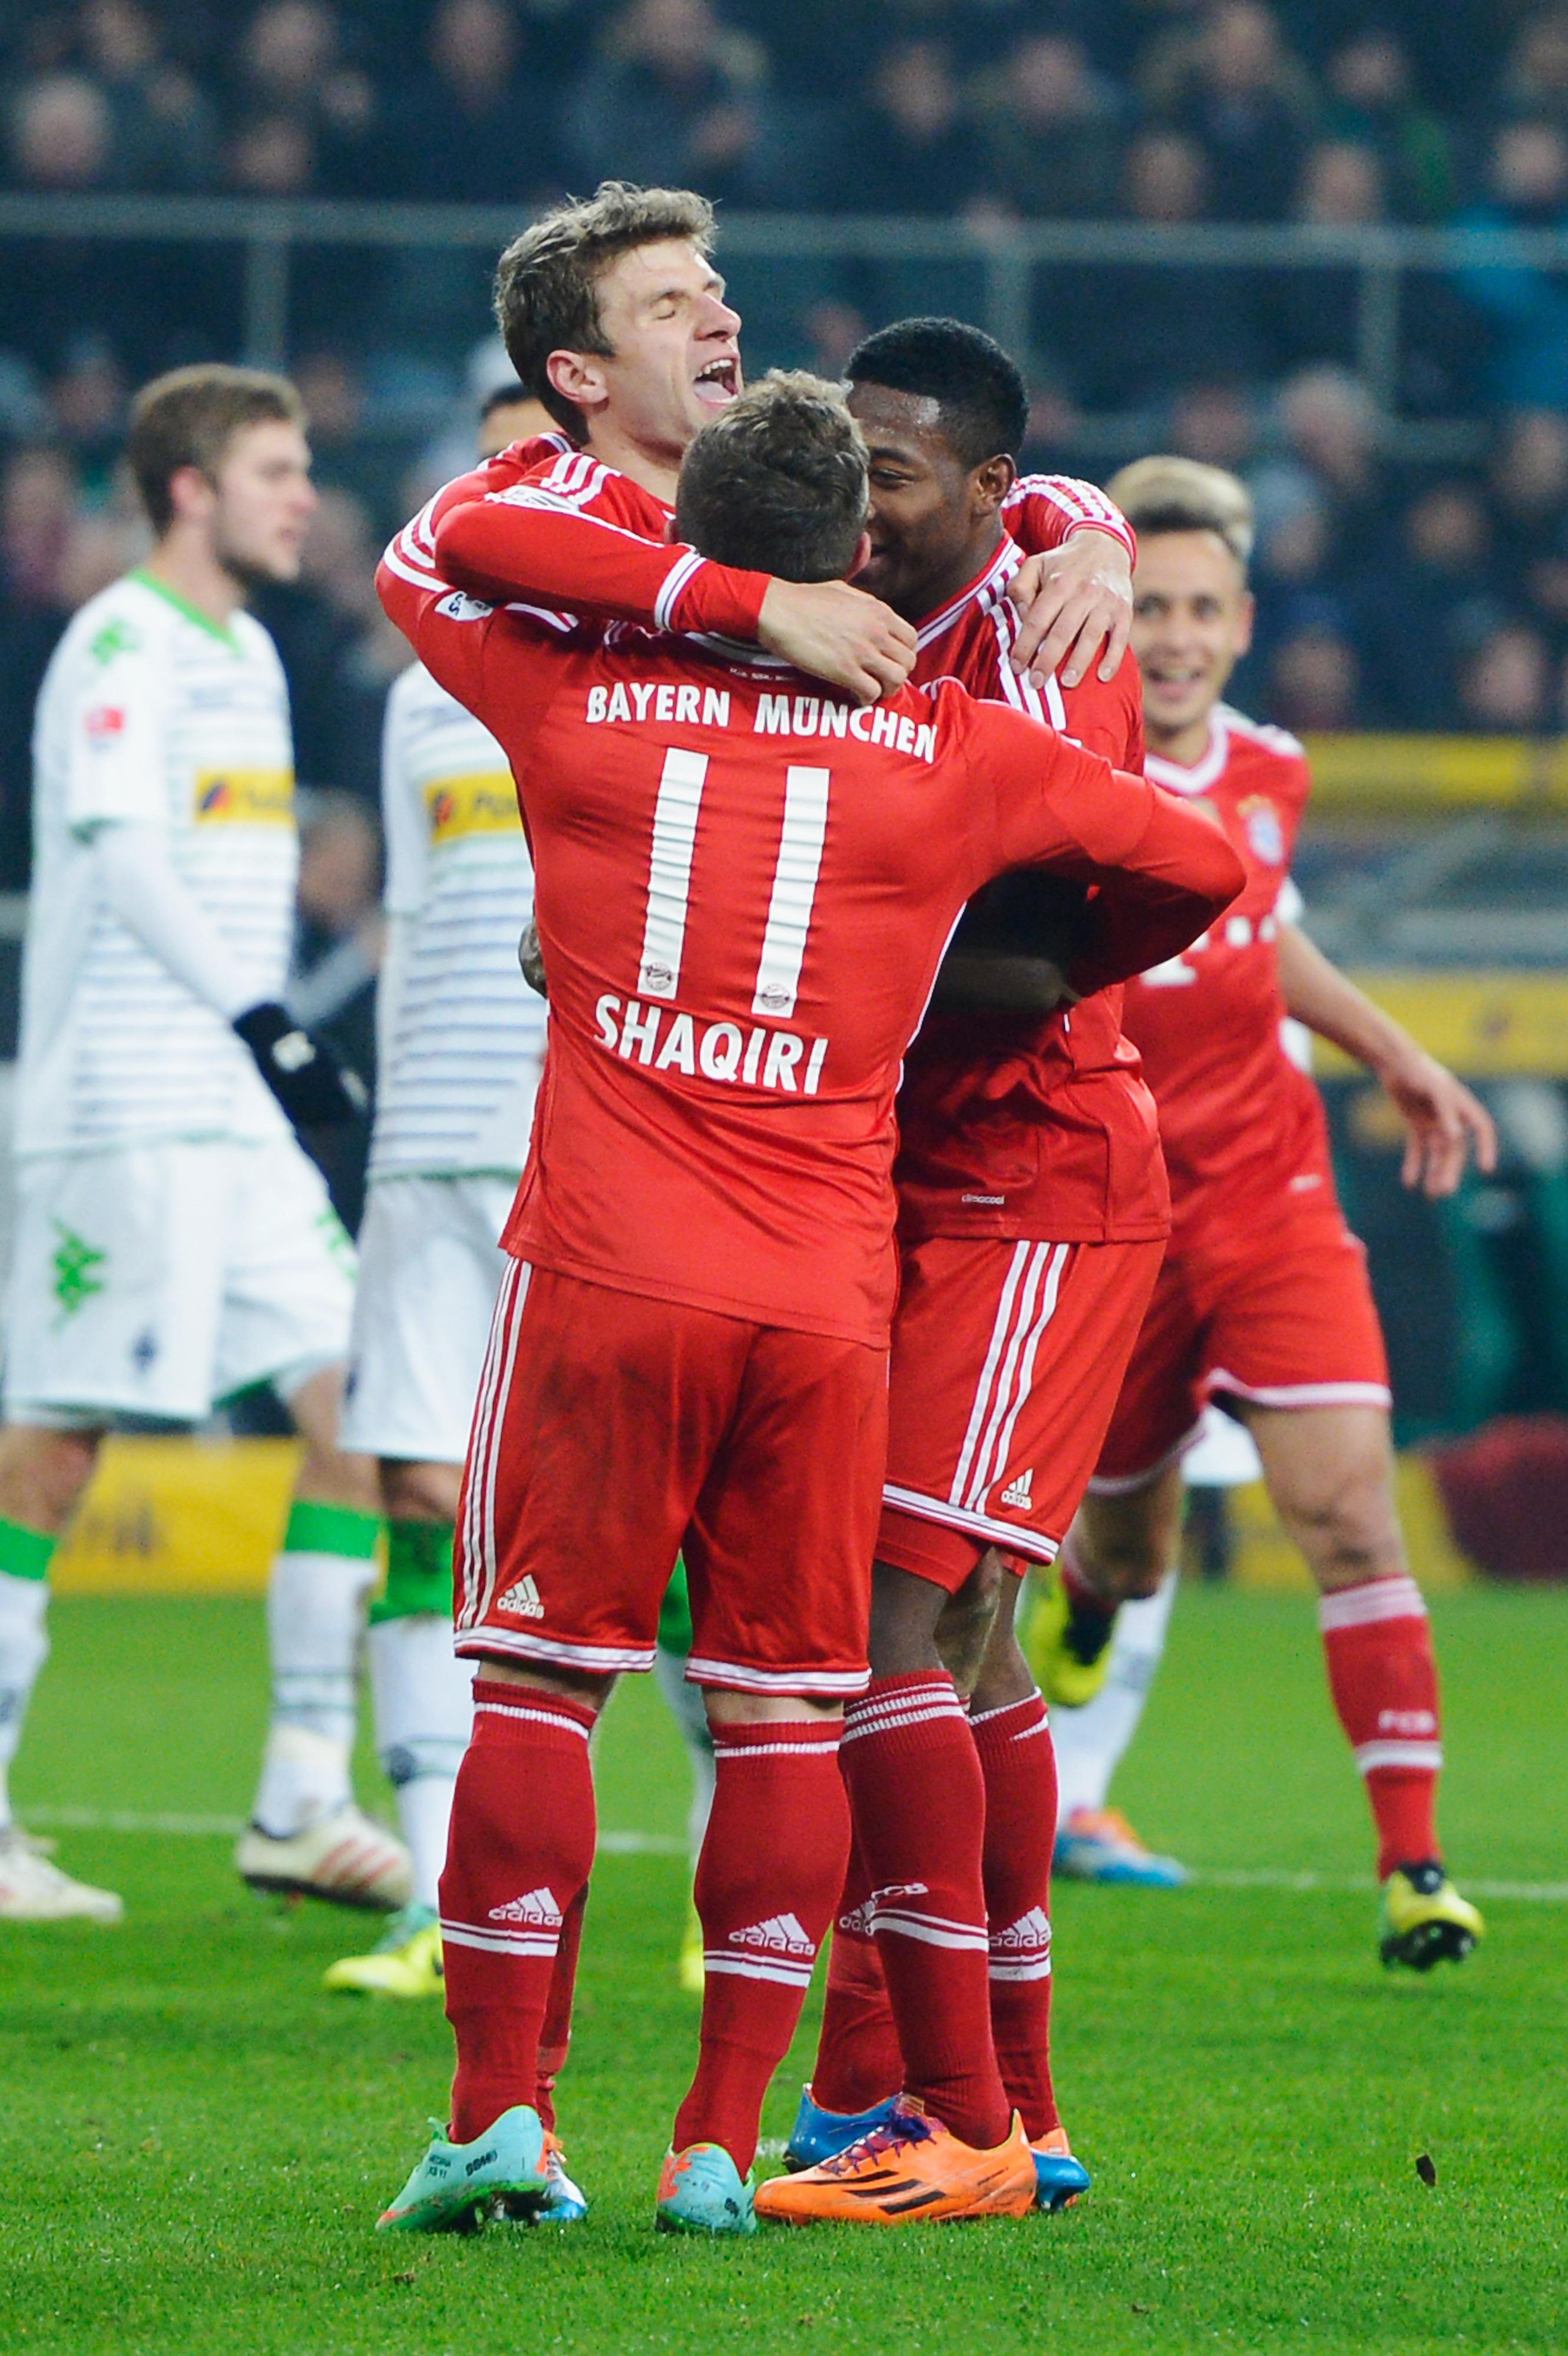 Borussia Mönchengladbach vs. Bayern Munich: Final score 0-2, easy for the Bavarians